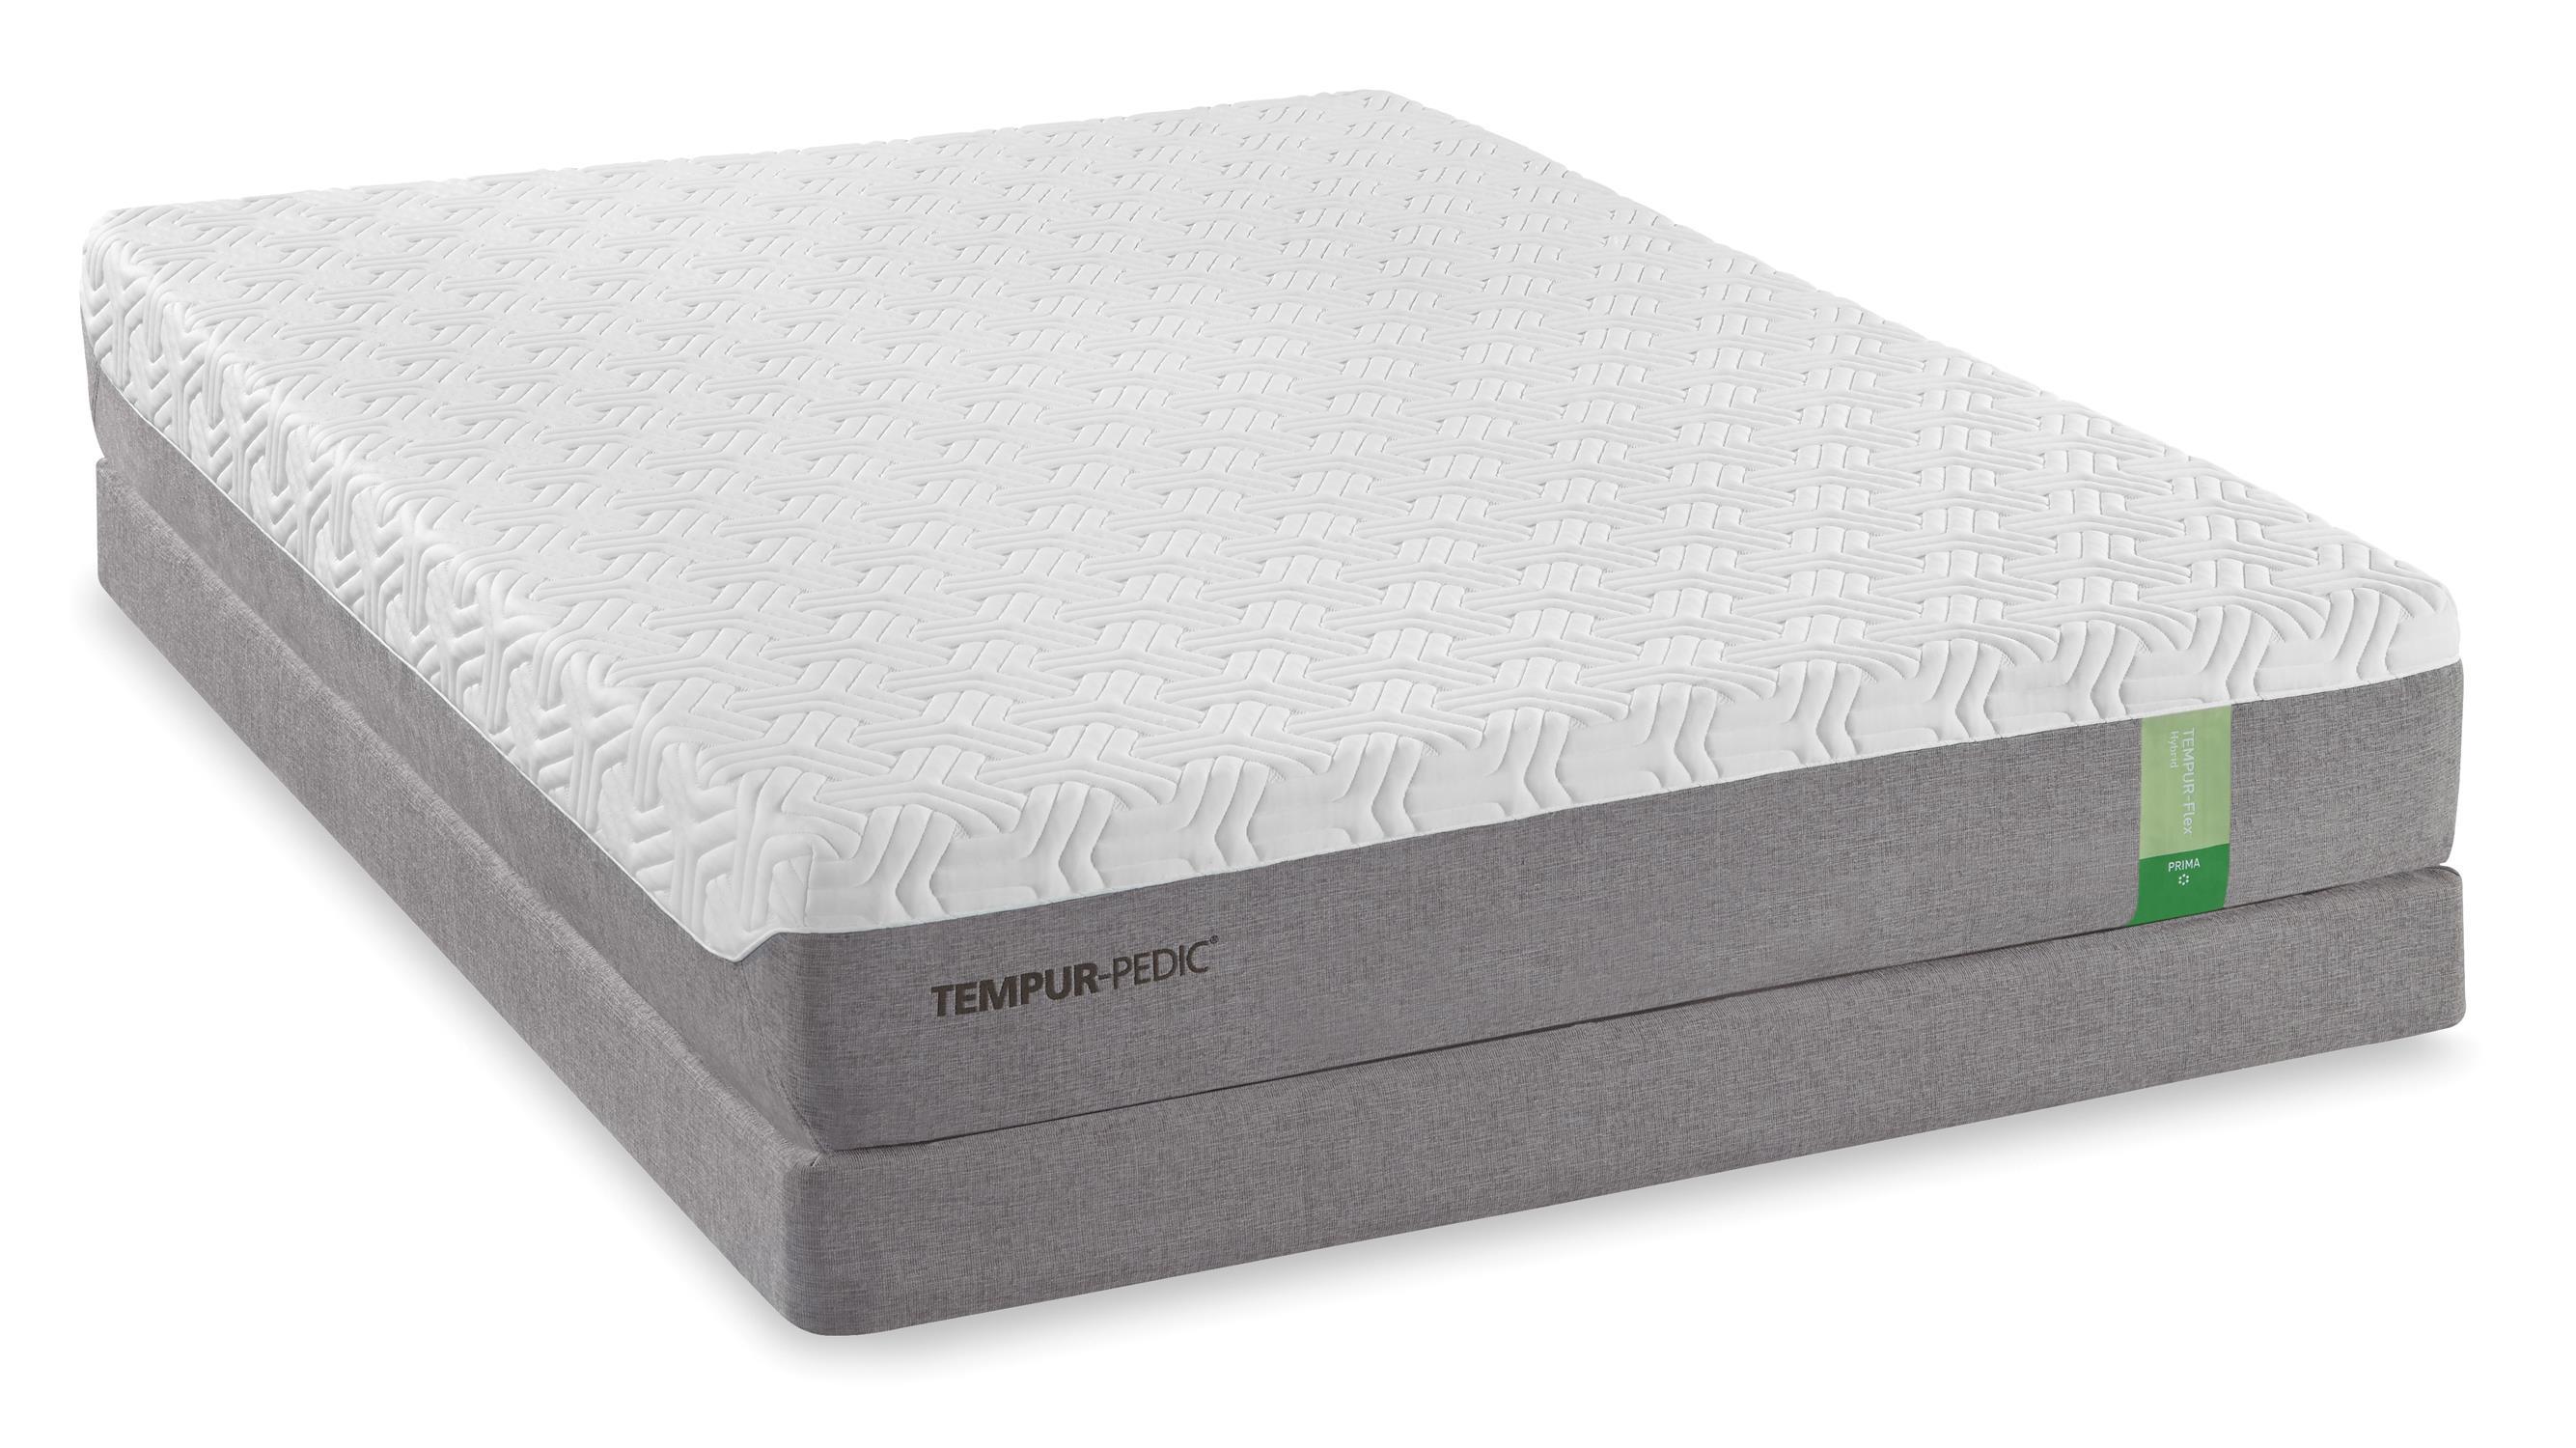 Tempur-Pedic® TEMPUR-Flex Prima King Medium Firm Mattress Set - Item Number: 10115270+2x20510120